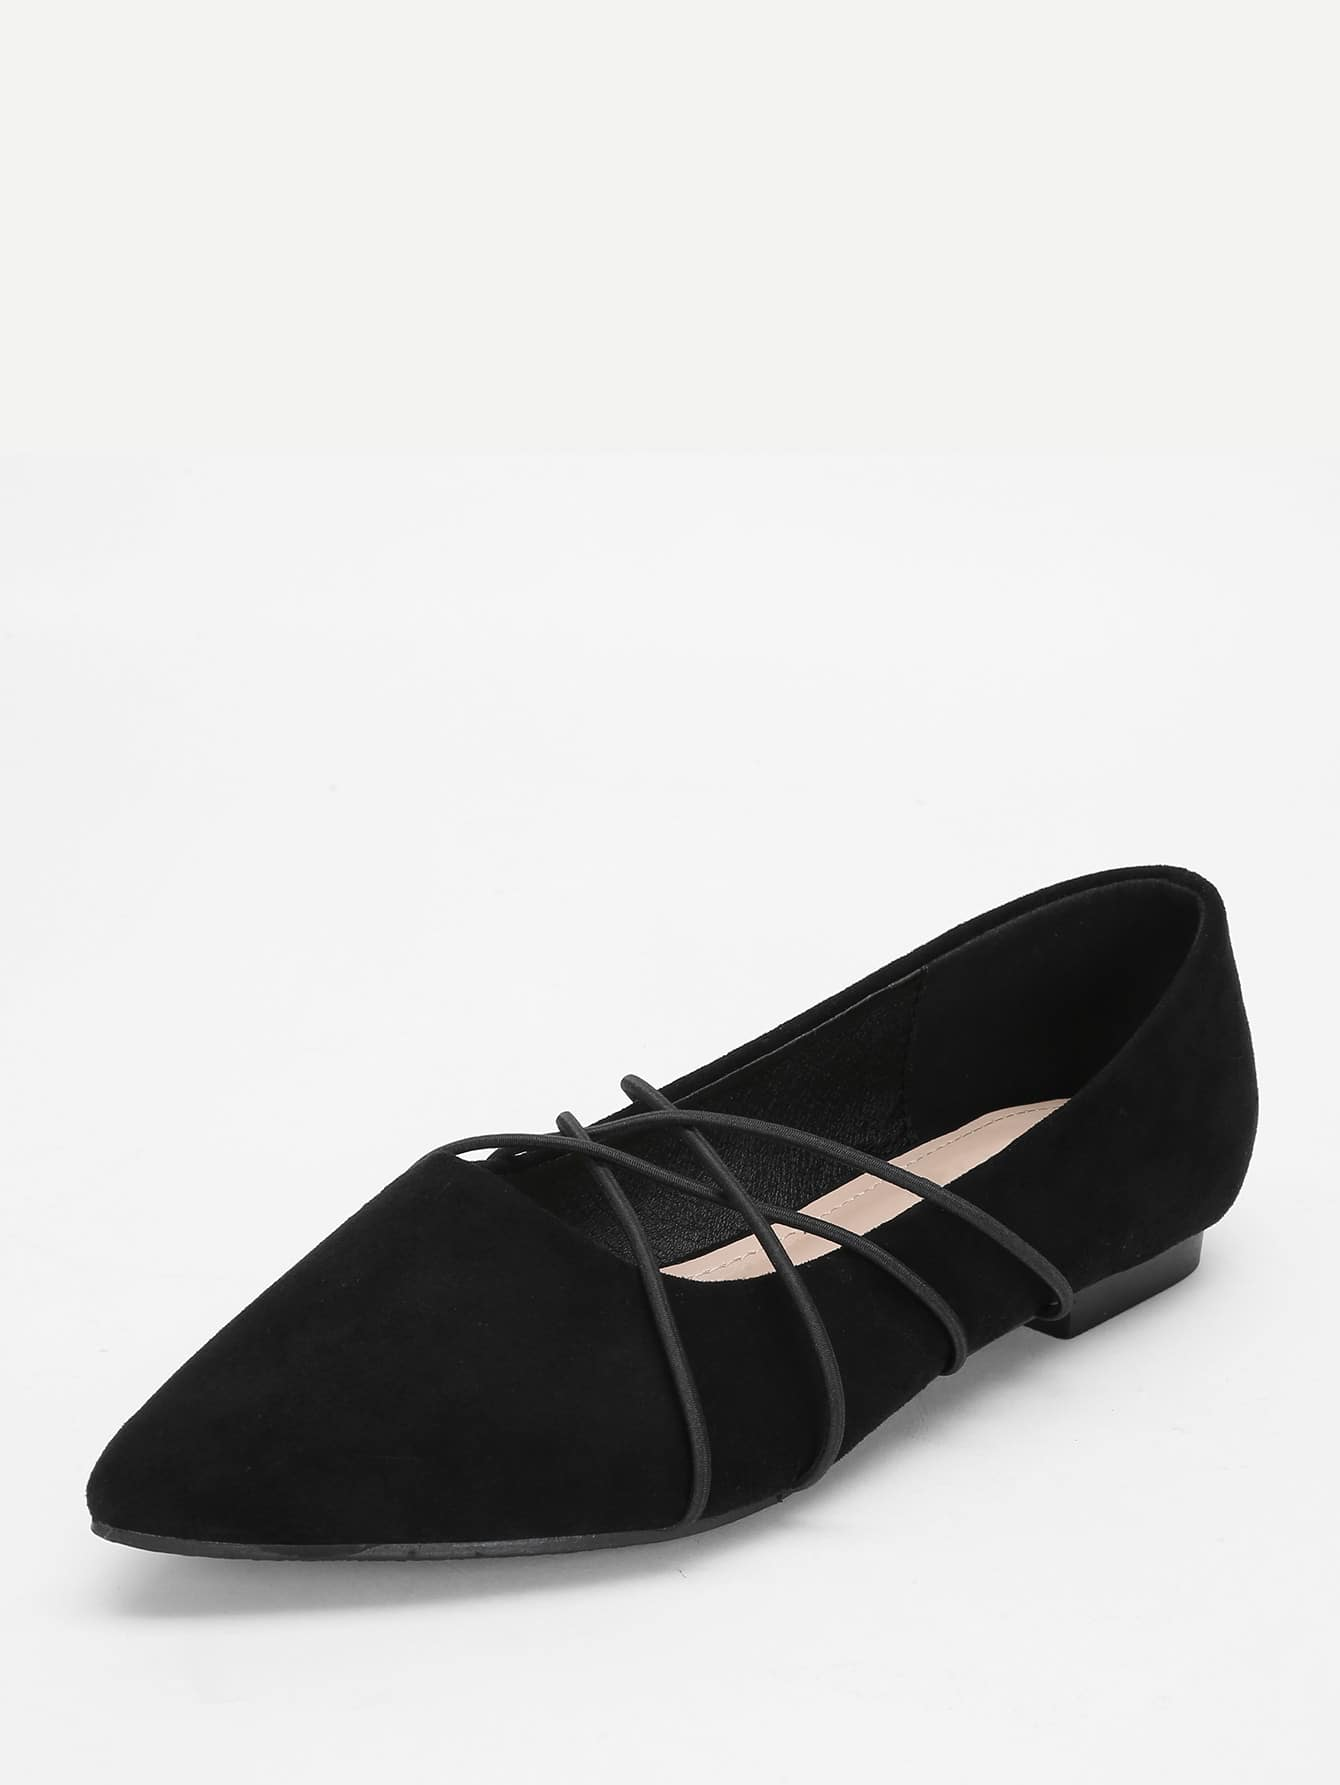 Chaussures plates en su d pointues crois es french romwe for Acheter maison suede